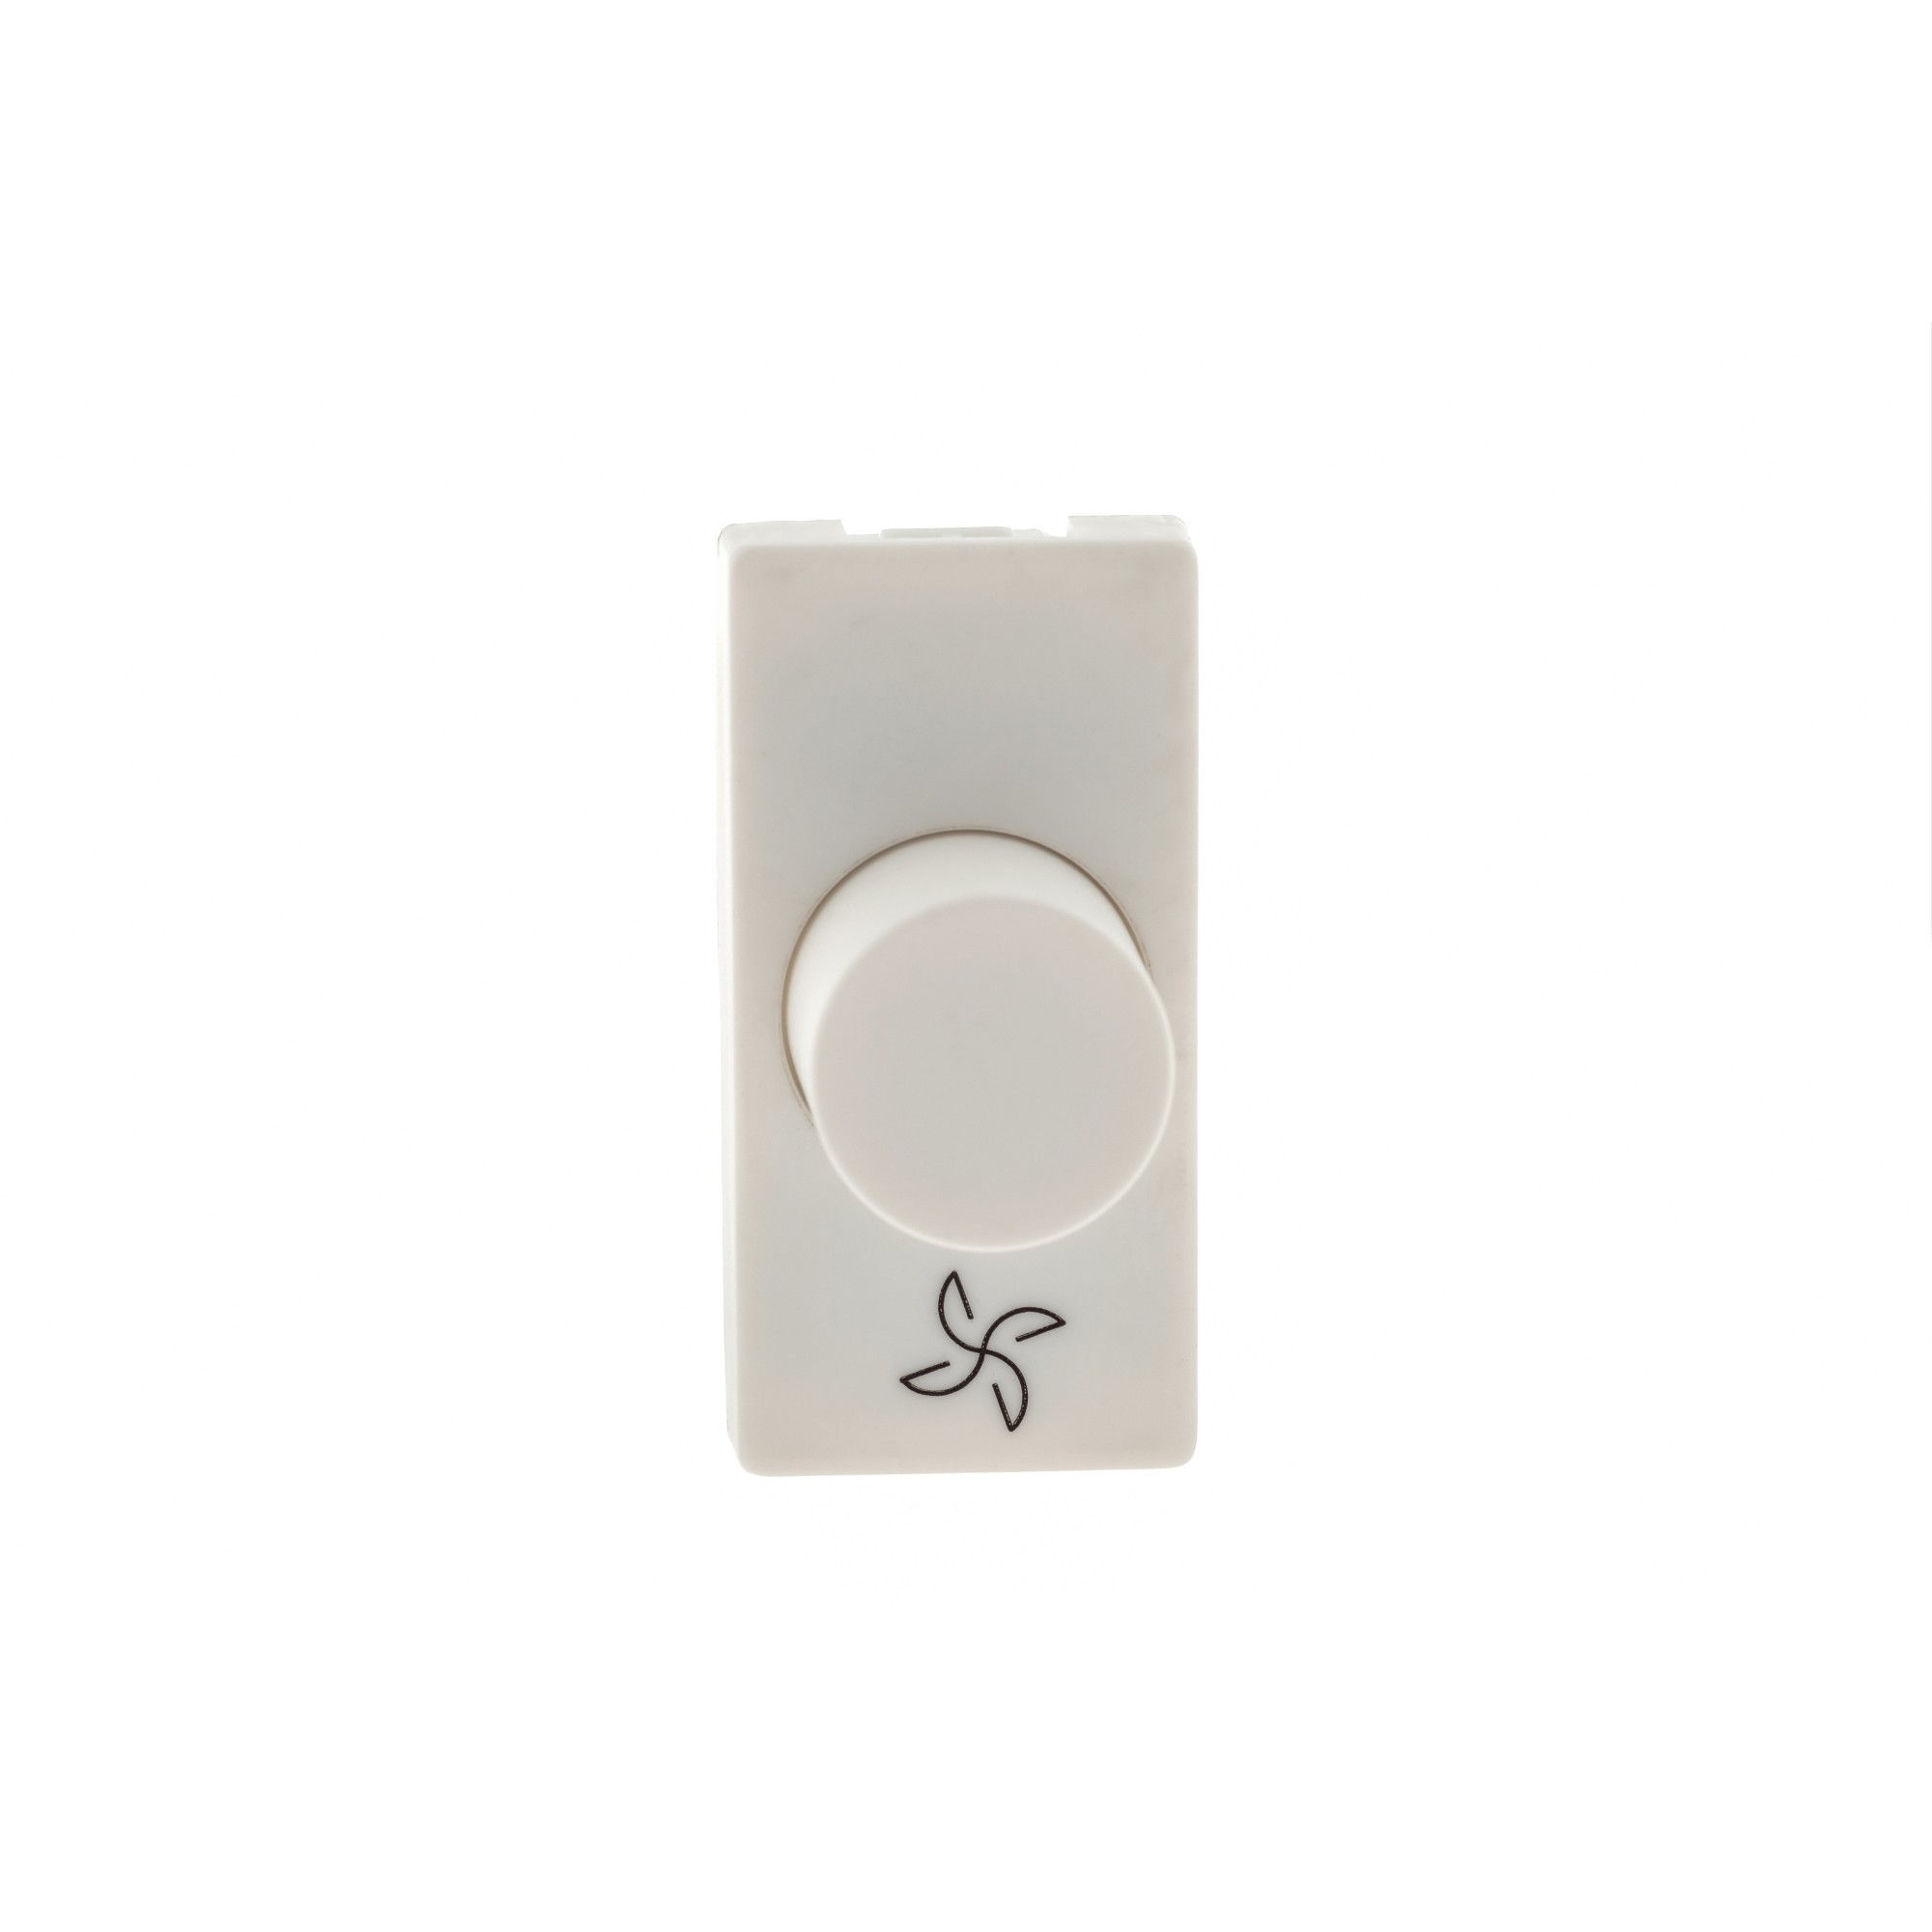 Variador de Velocidade Rotativo Modular de Embutir Bivolt Branco Plus - Legrand